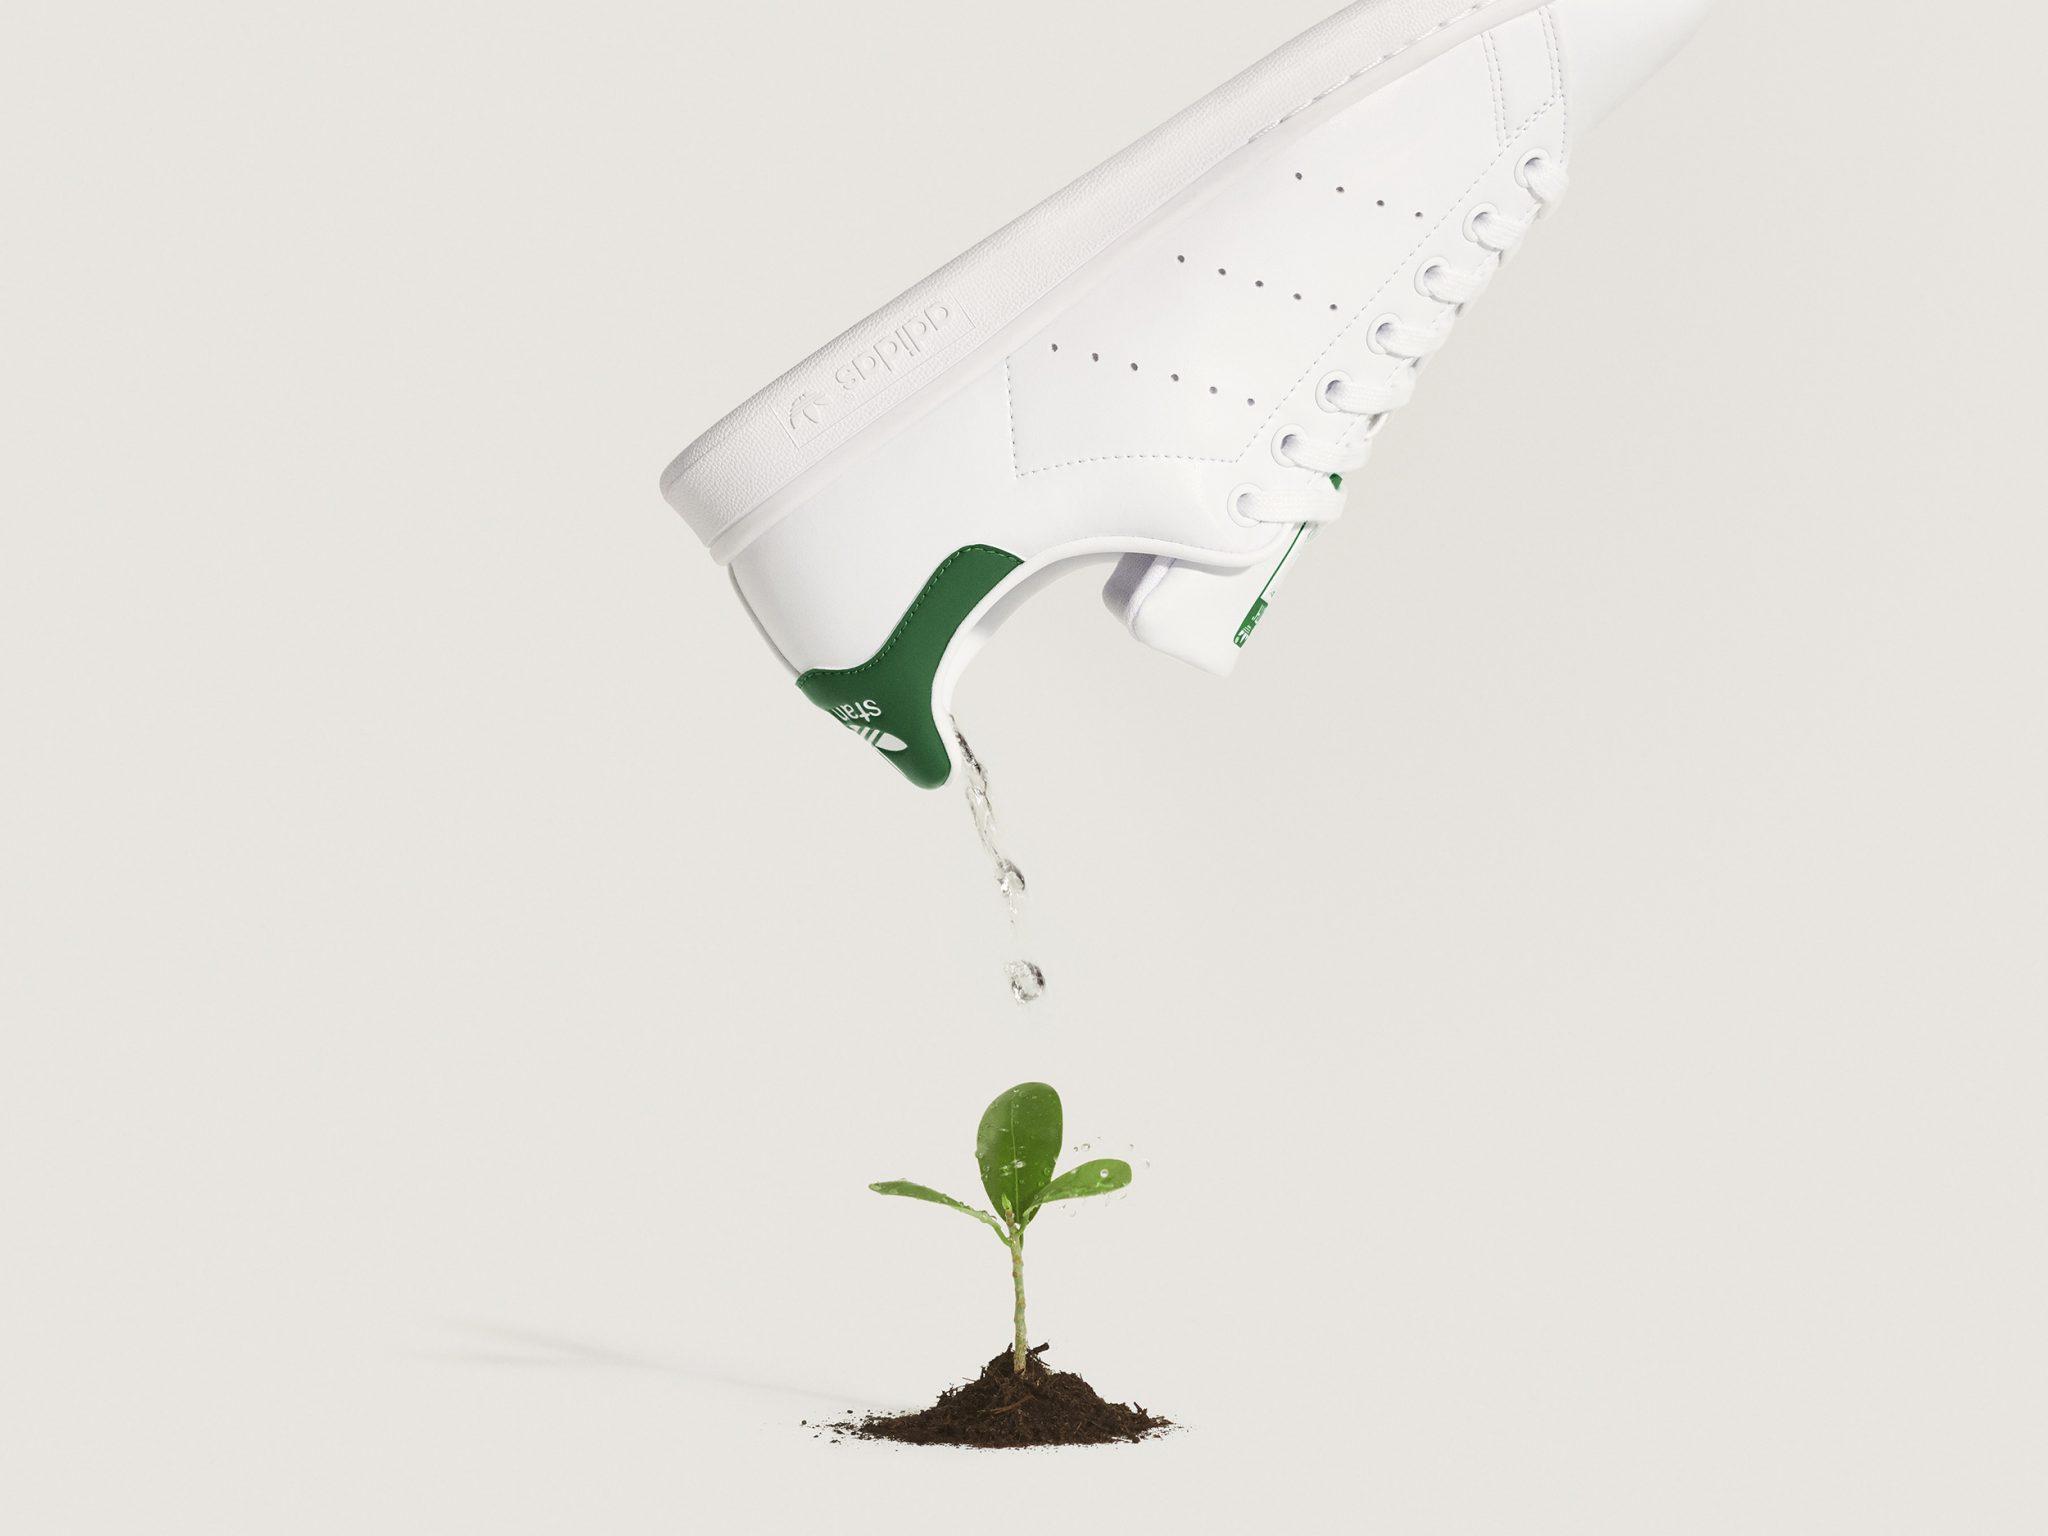 Adidas has a new SVP sustainability, Katja Schreiber